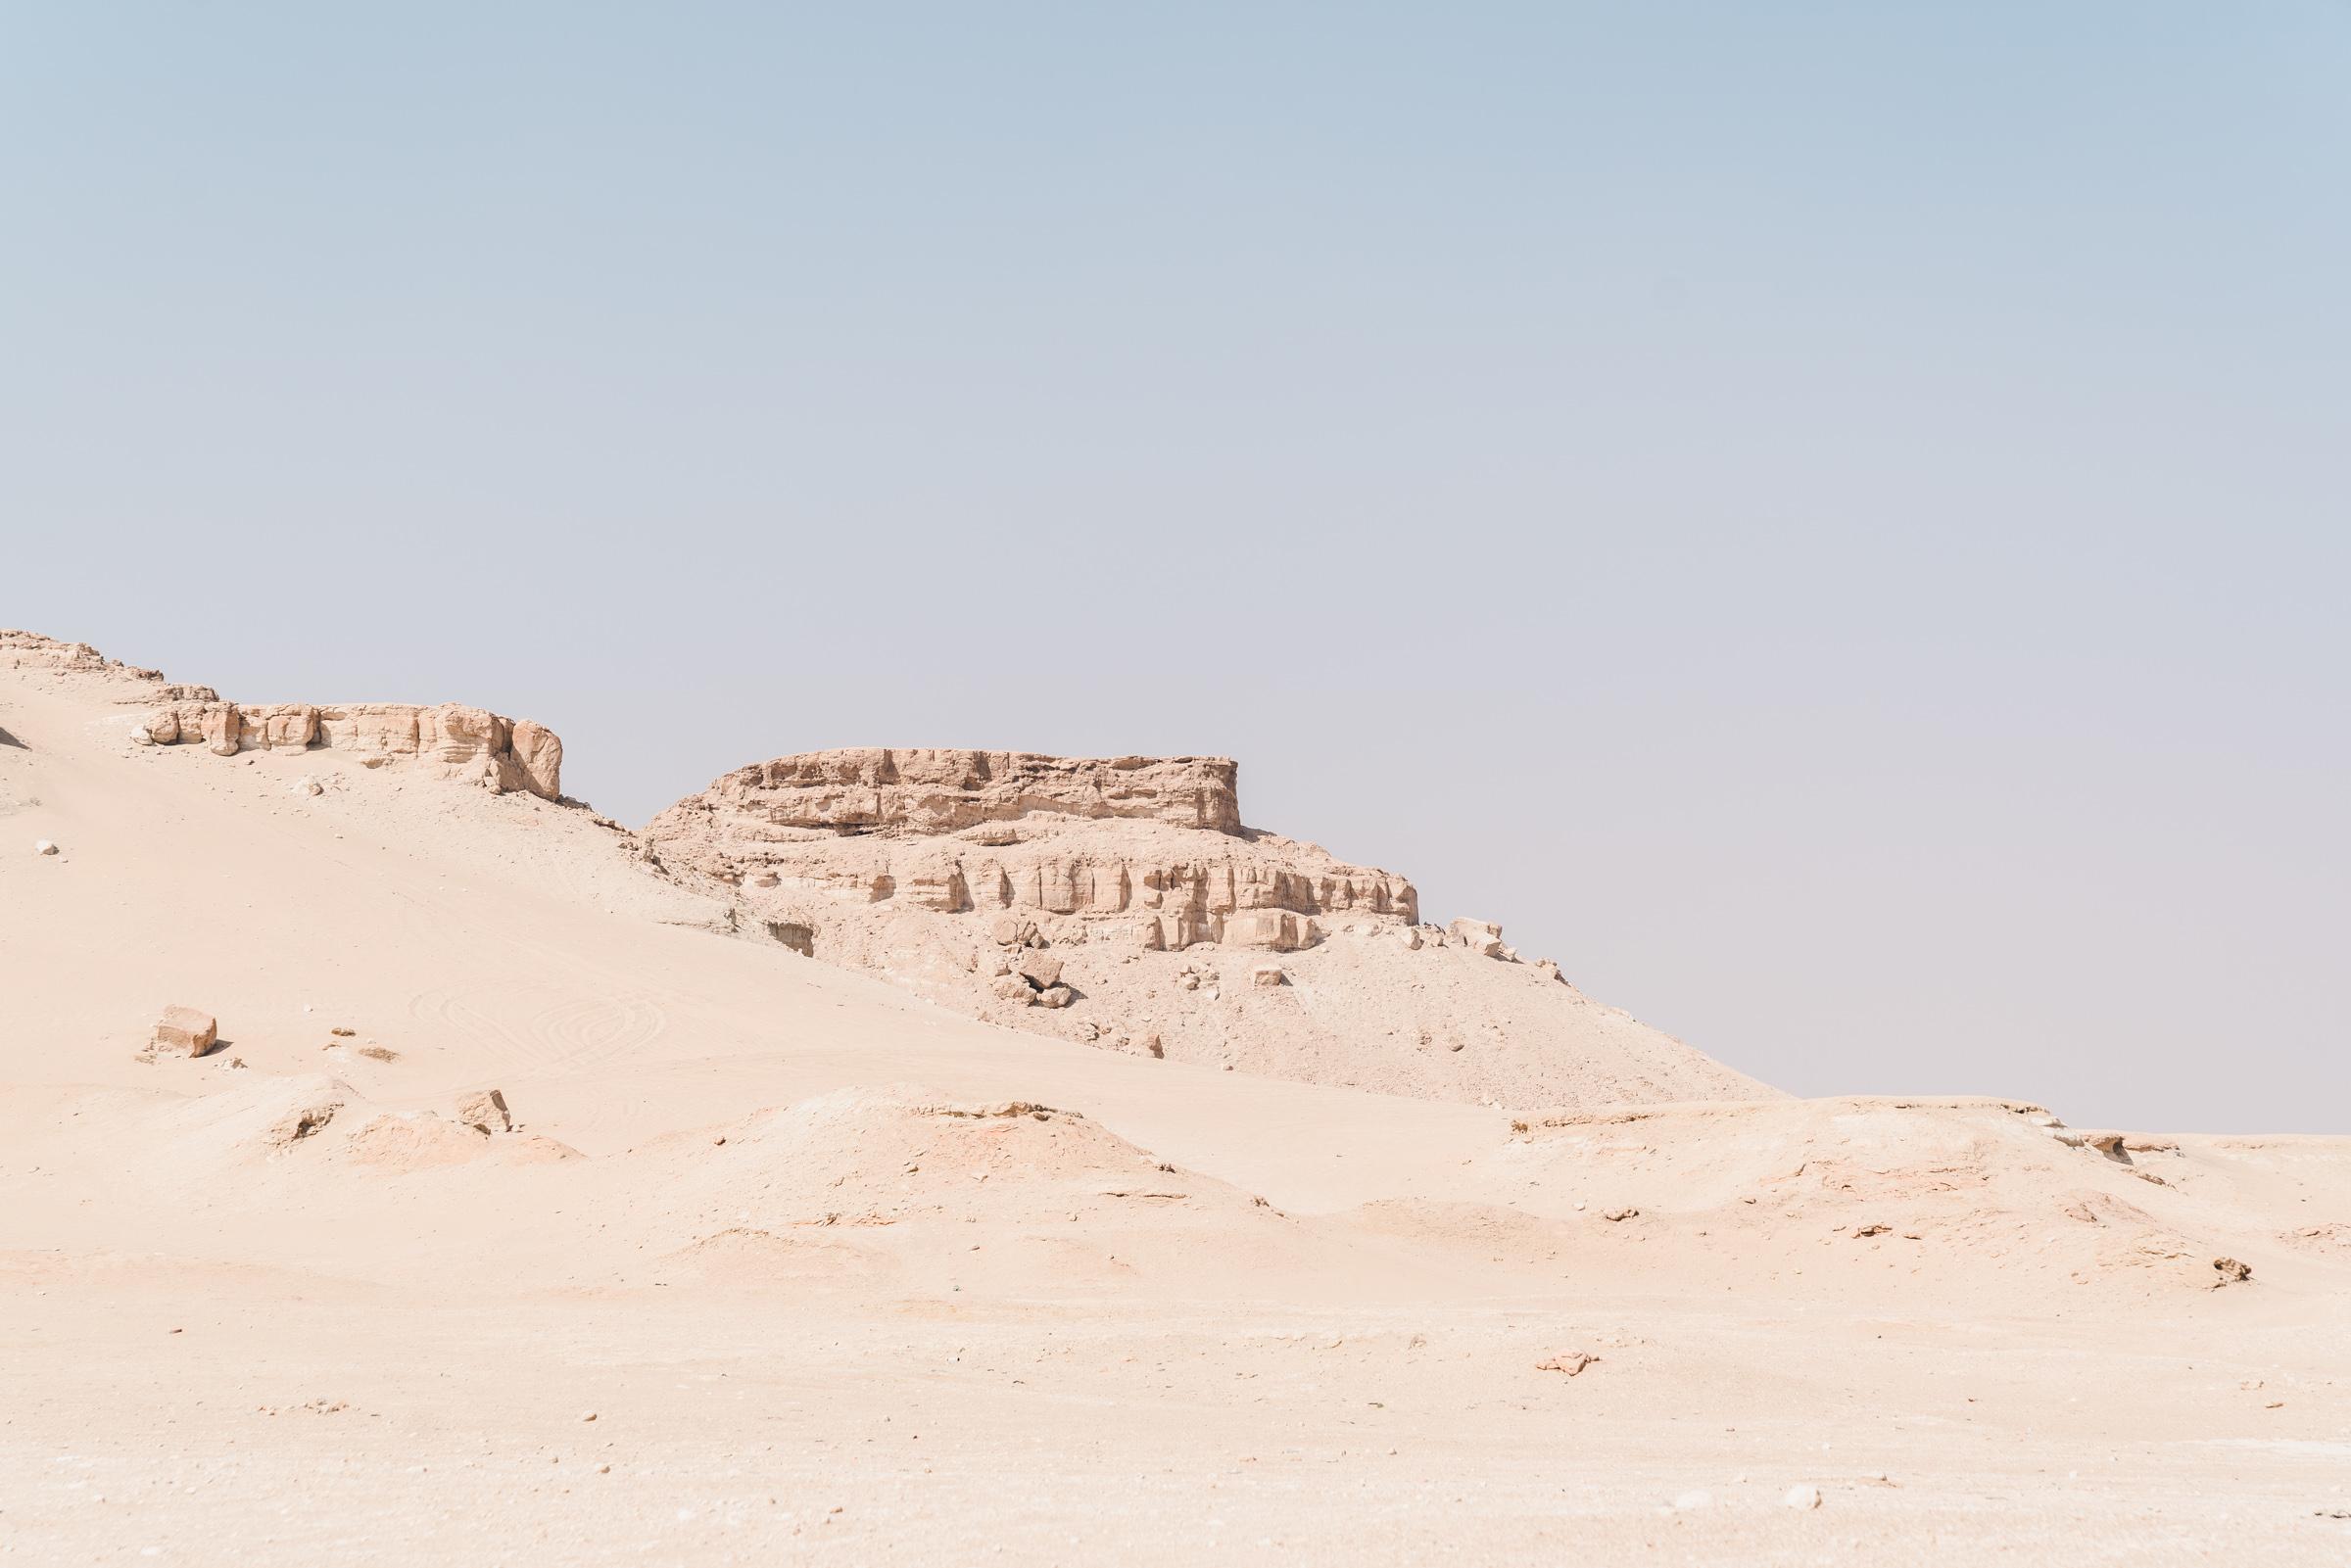 Mutla Ridge. Kuwait Desert, Kuwait